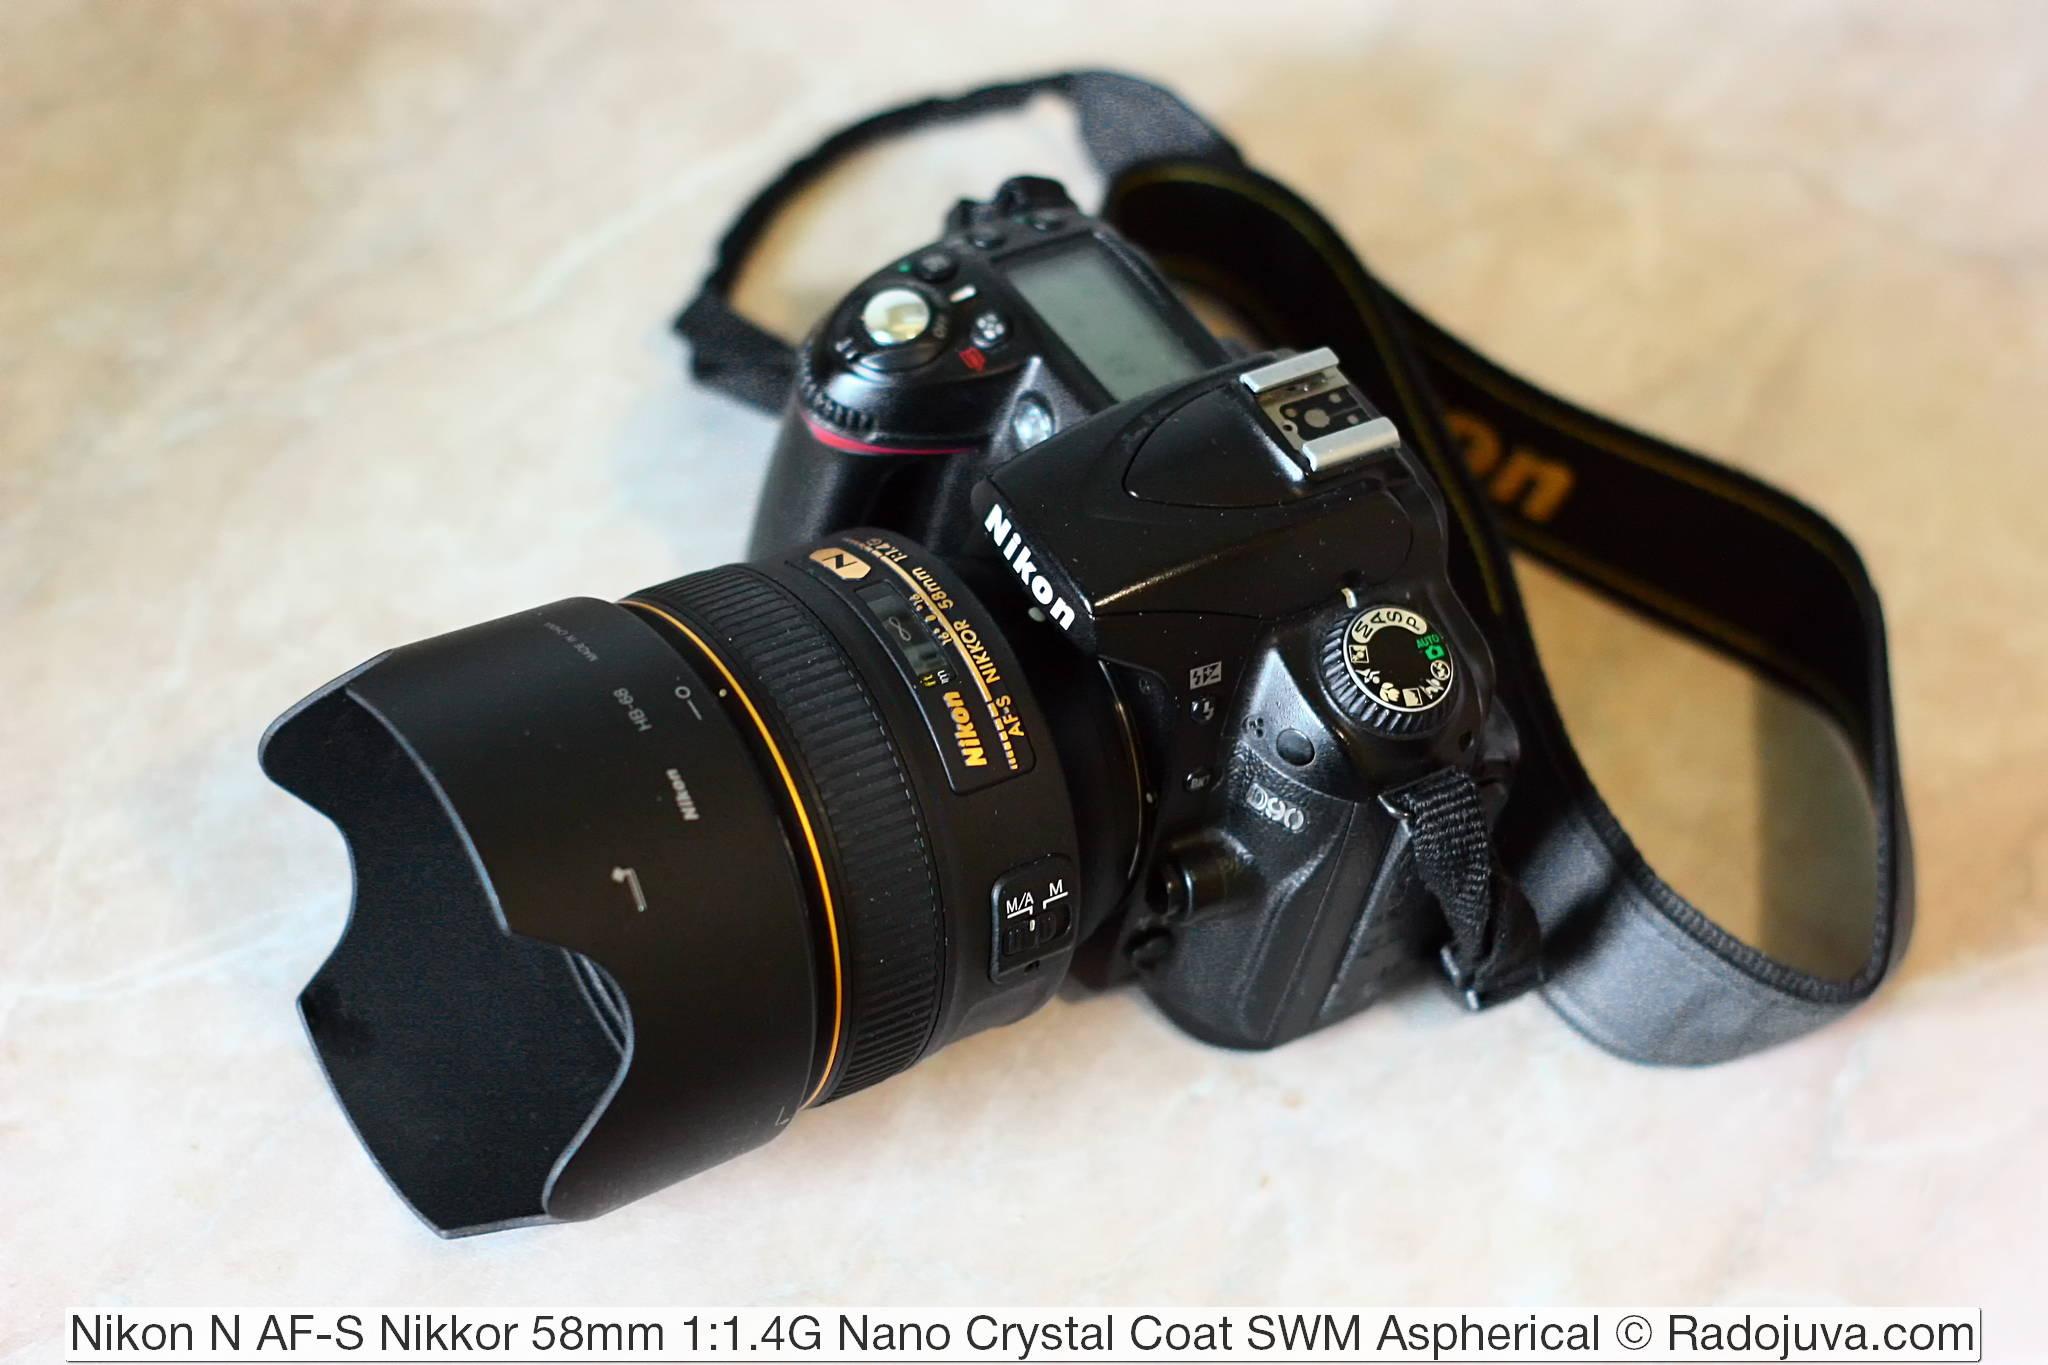 Nikon N AF-S Nikkor 58mm 1:1.4G Nano Crystal Coat SWM Aspherical